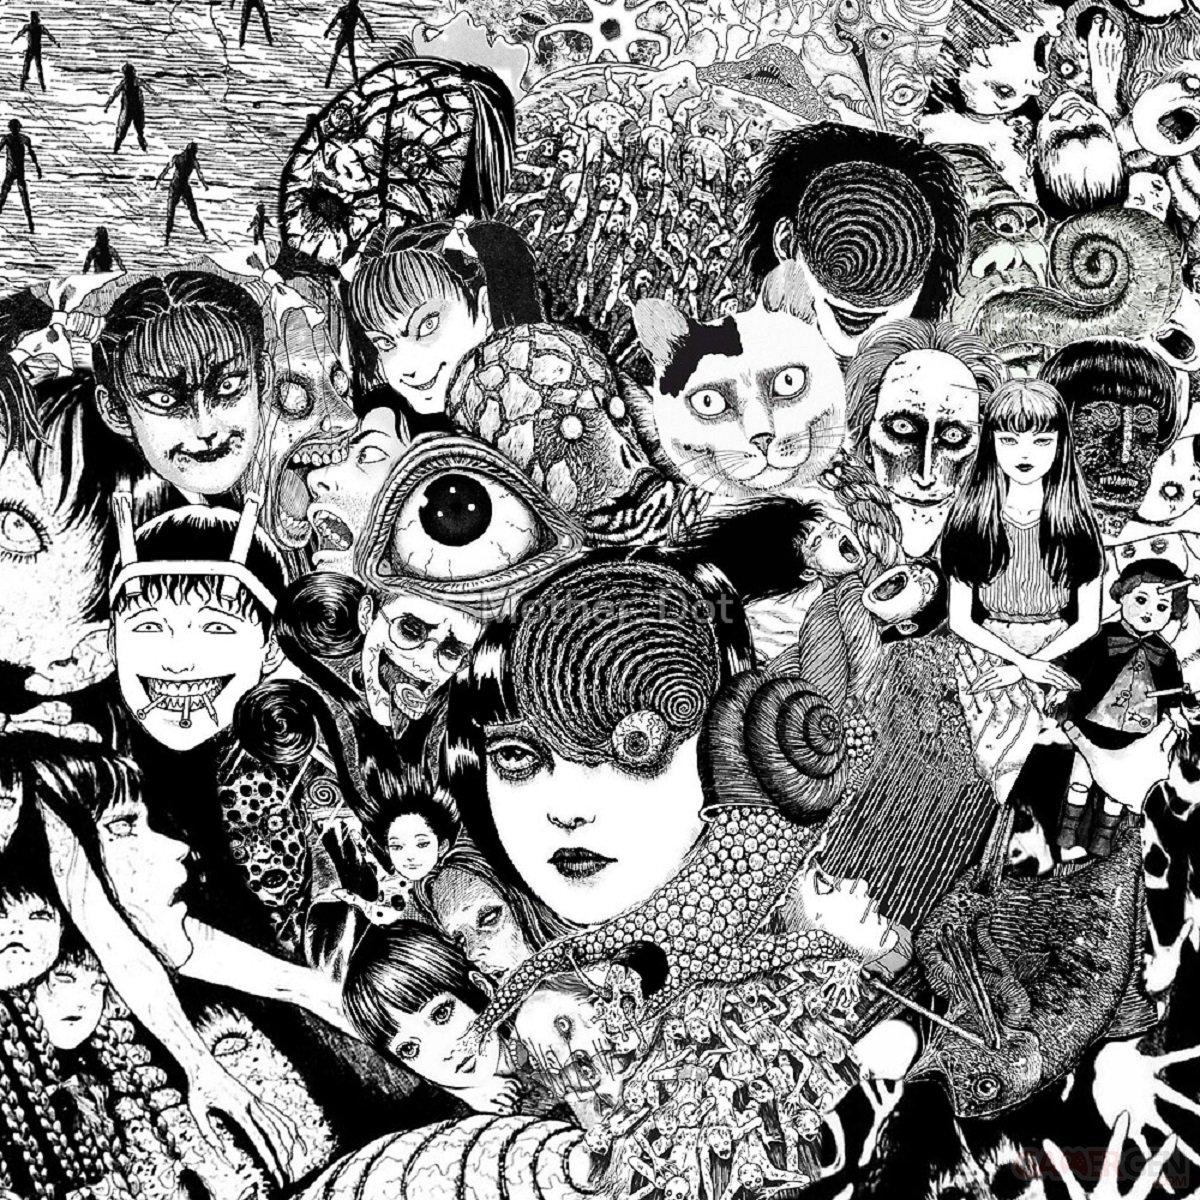 Junji Itô et Kojima : vers un projet ensemble ?